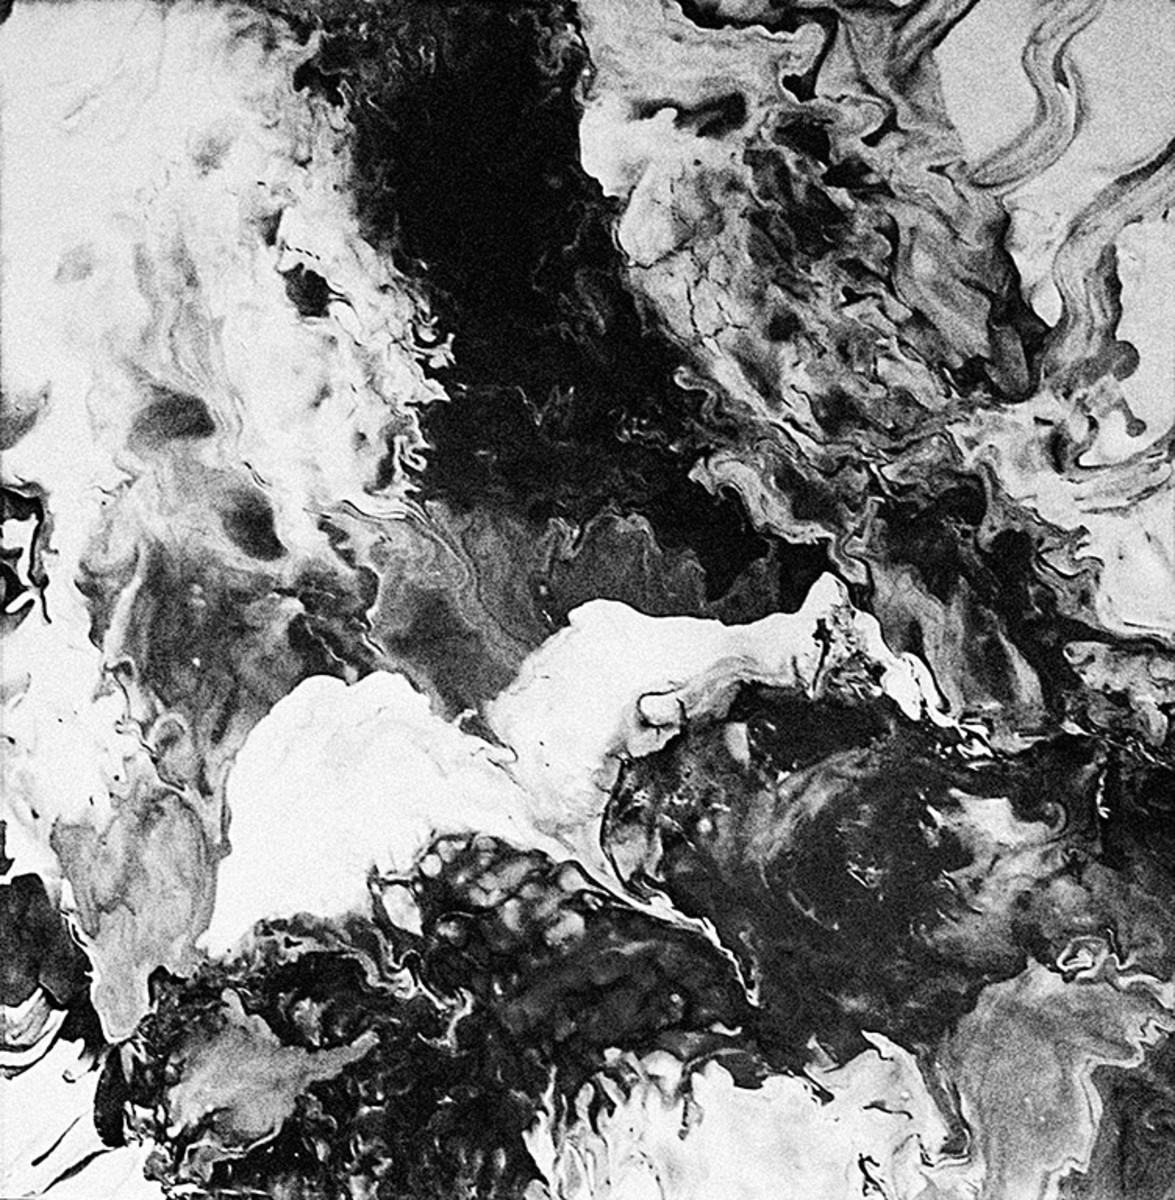 KOMA001_Cover_Artwork_web_Front